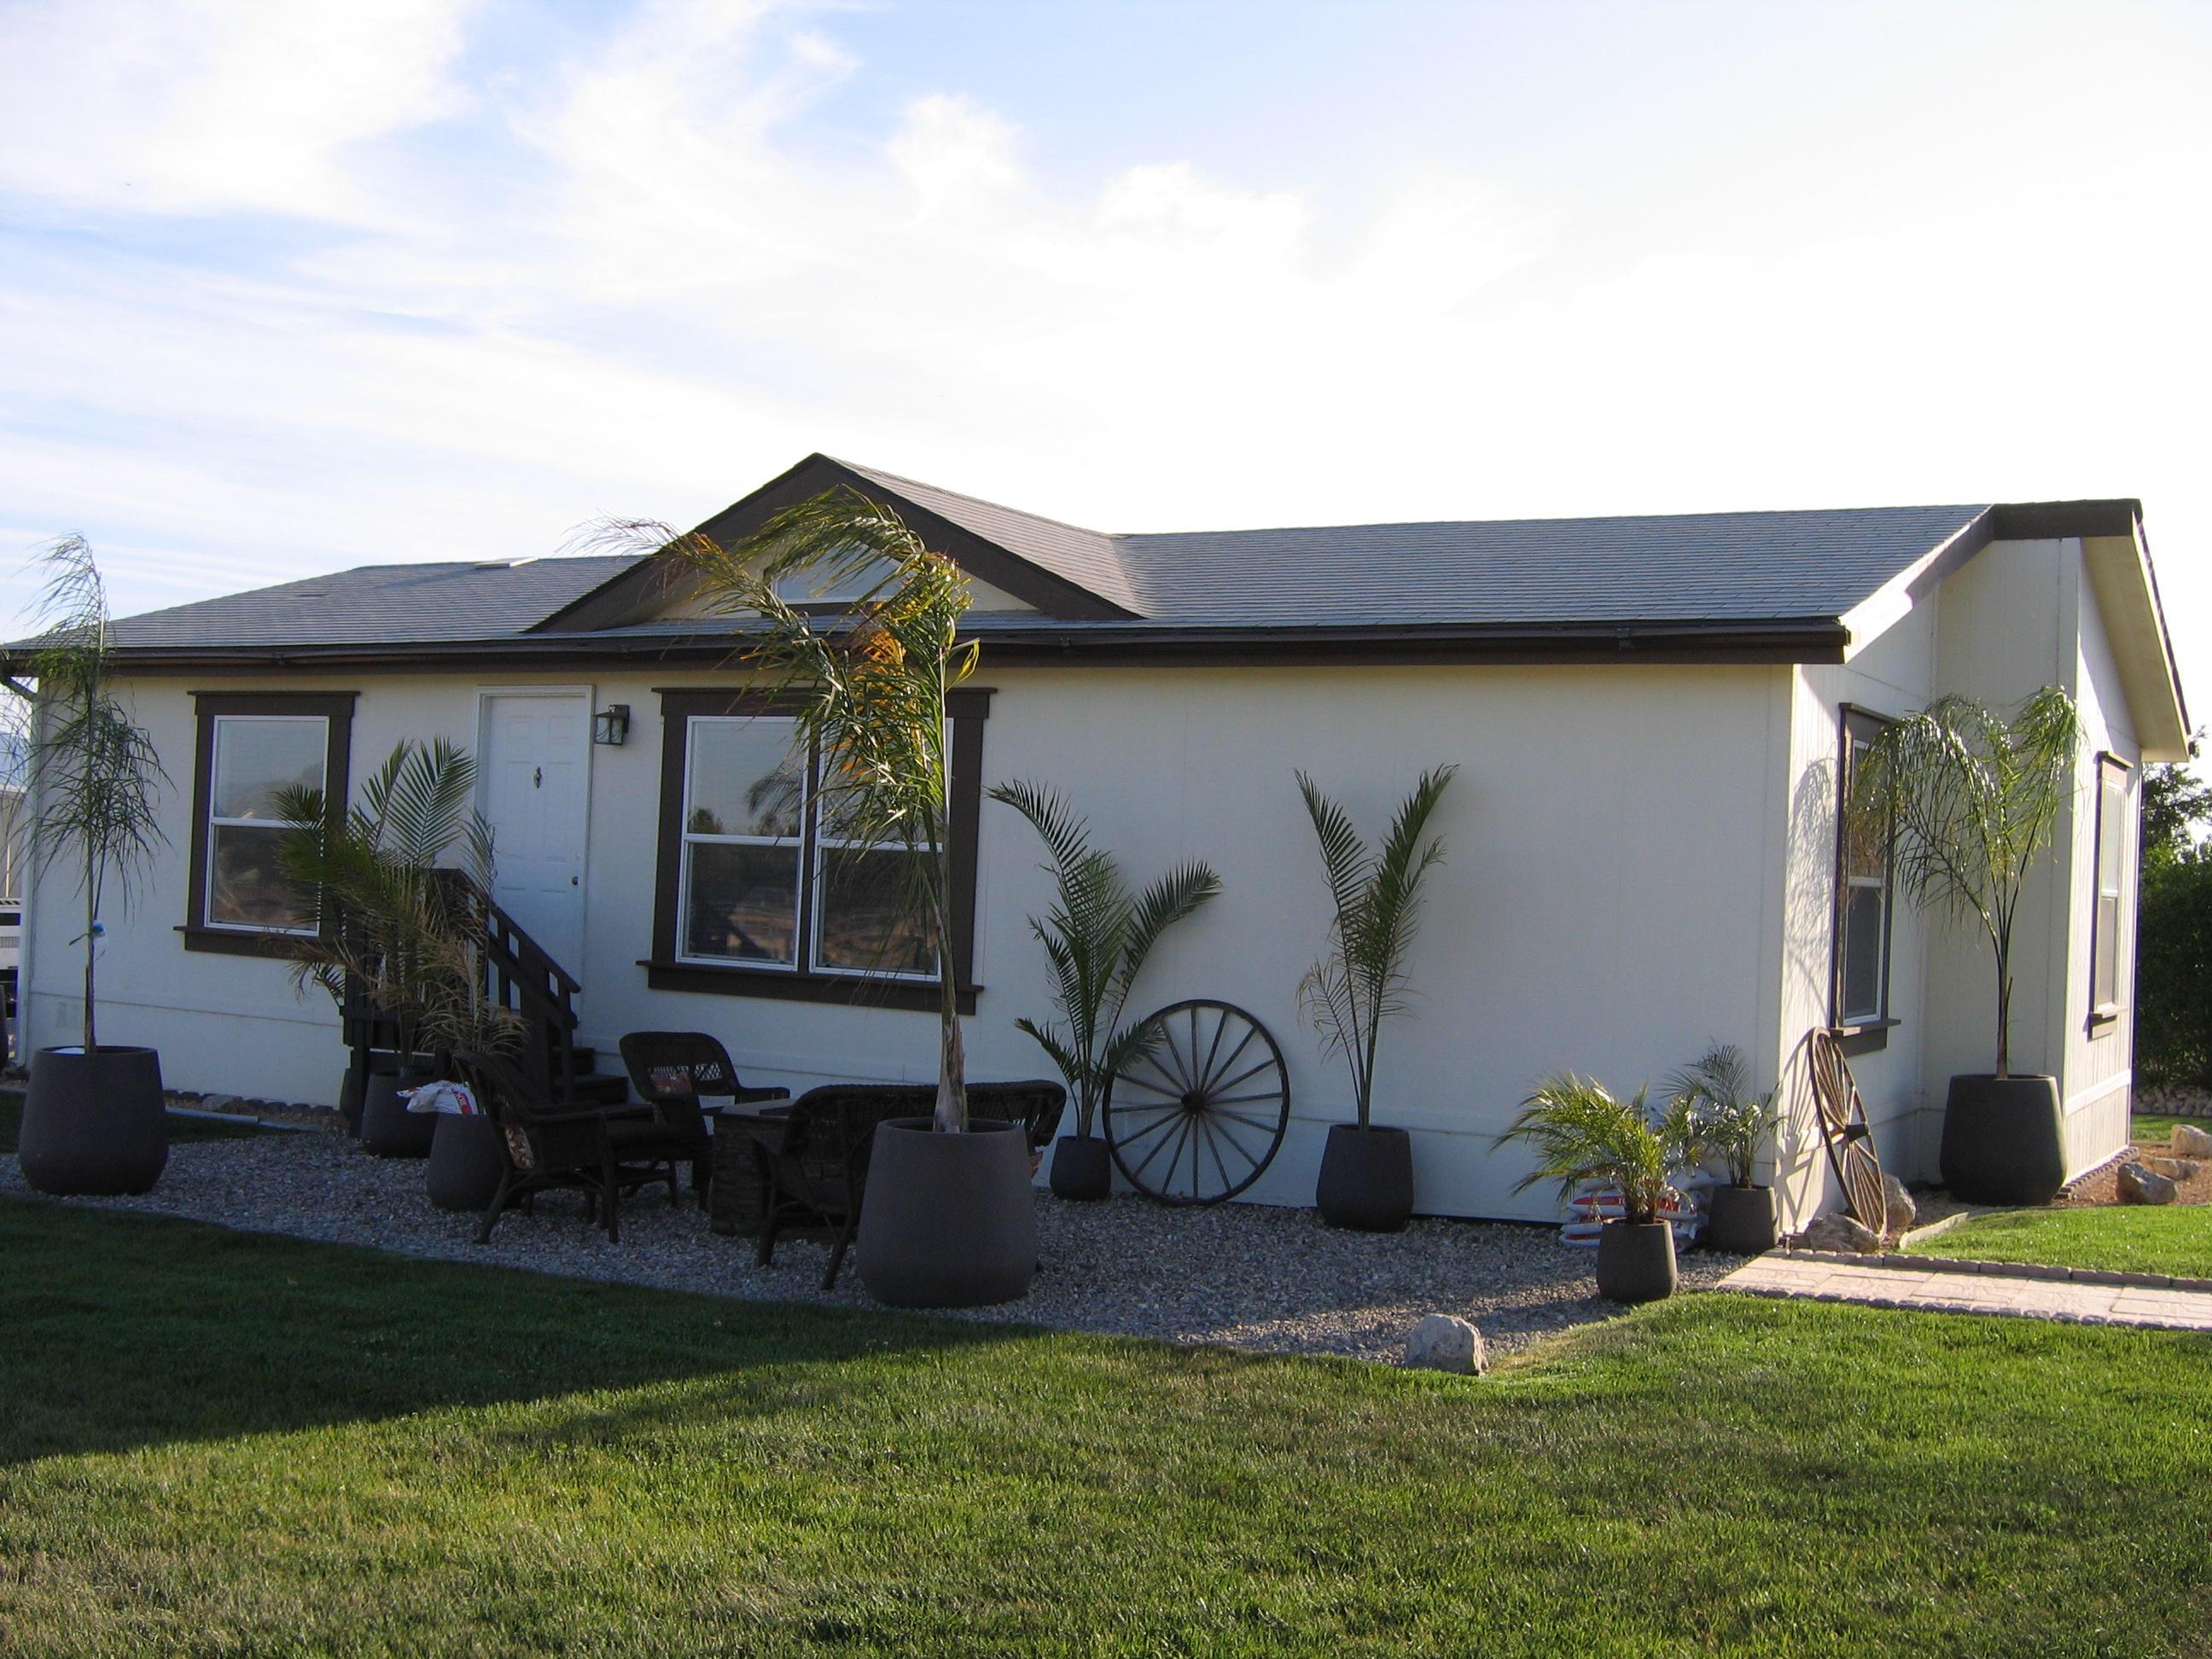 Property photo for 3640 Roblar Ave Santa Ynez, California 93460 - 14-3542